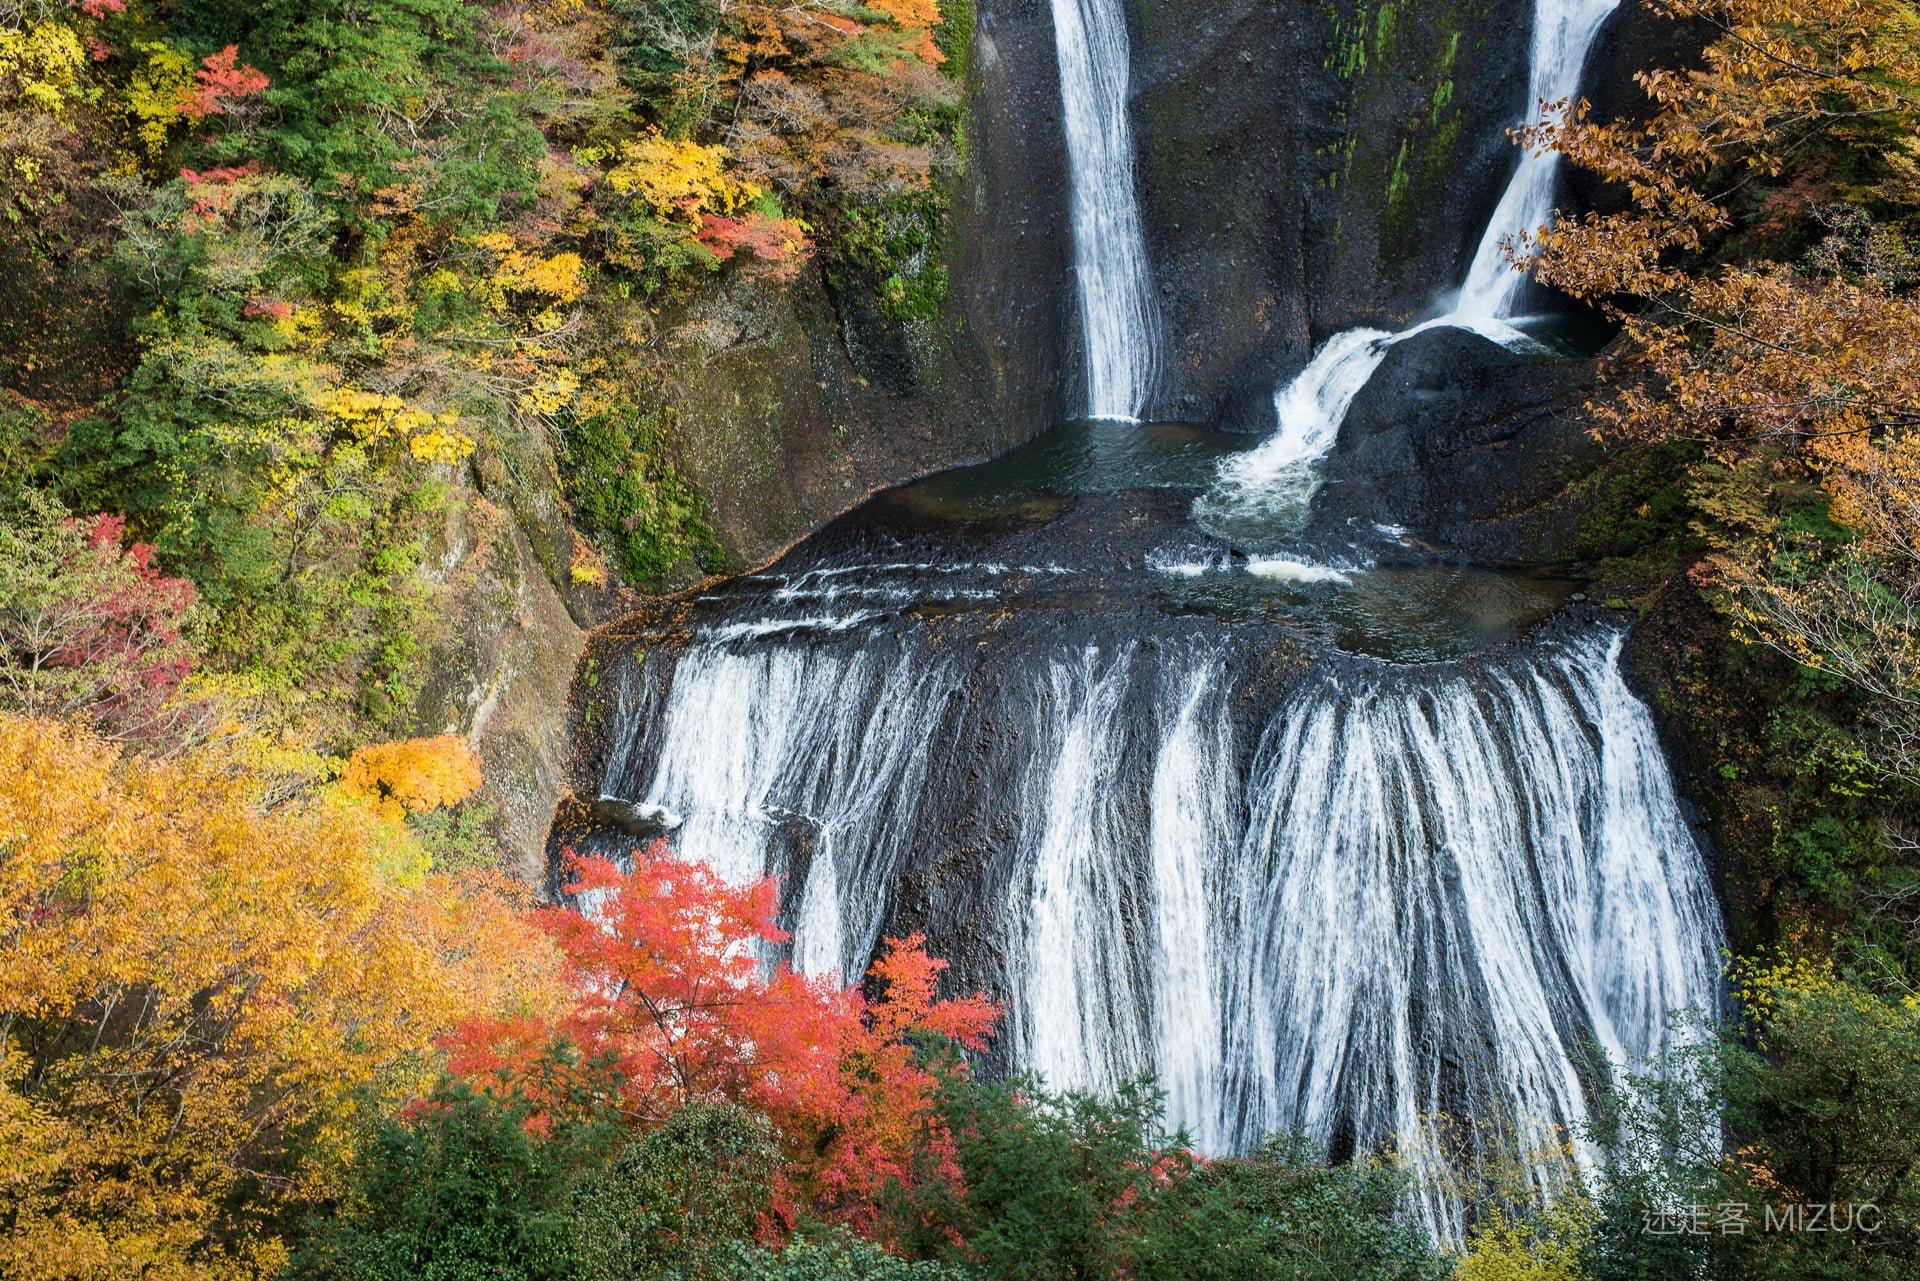 201711 Ibaraki Tochigi Gunma Japan Travel By RentalCar 39 日本自駕旅遊/北關東三縣「茨城、櫪木、群馬」秋天美食、溫泉與瀑布秘境百景(精選照片分享)